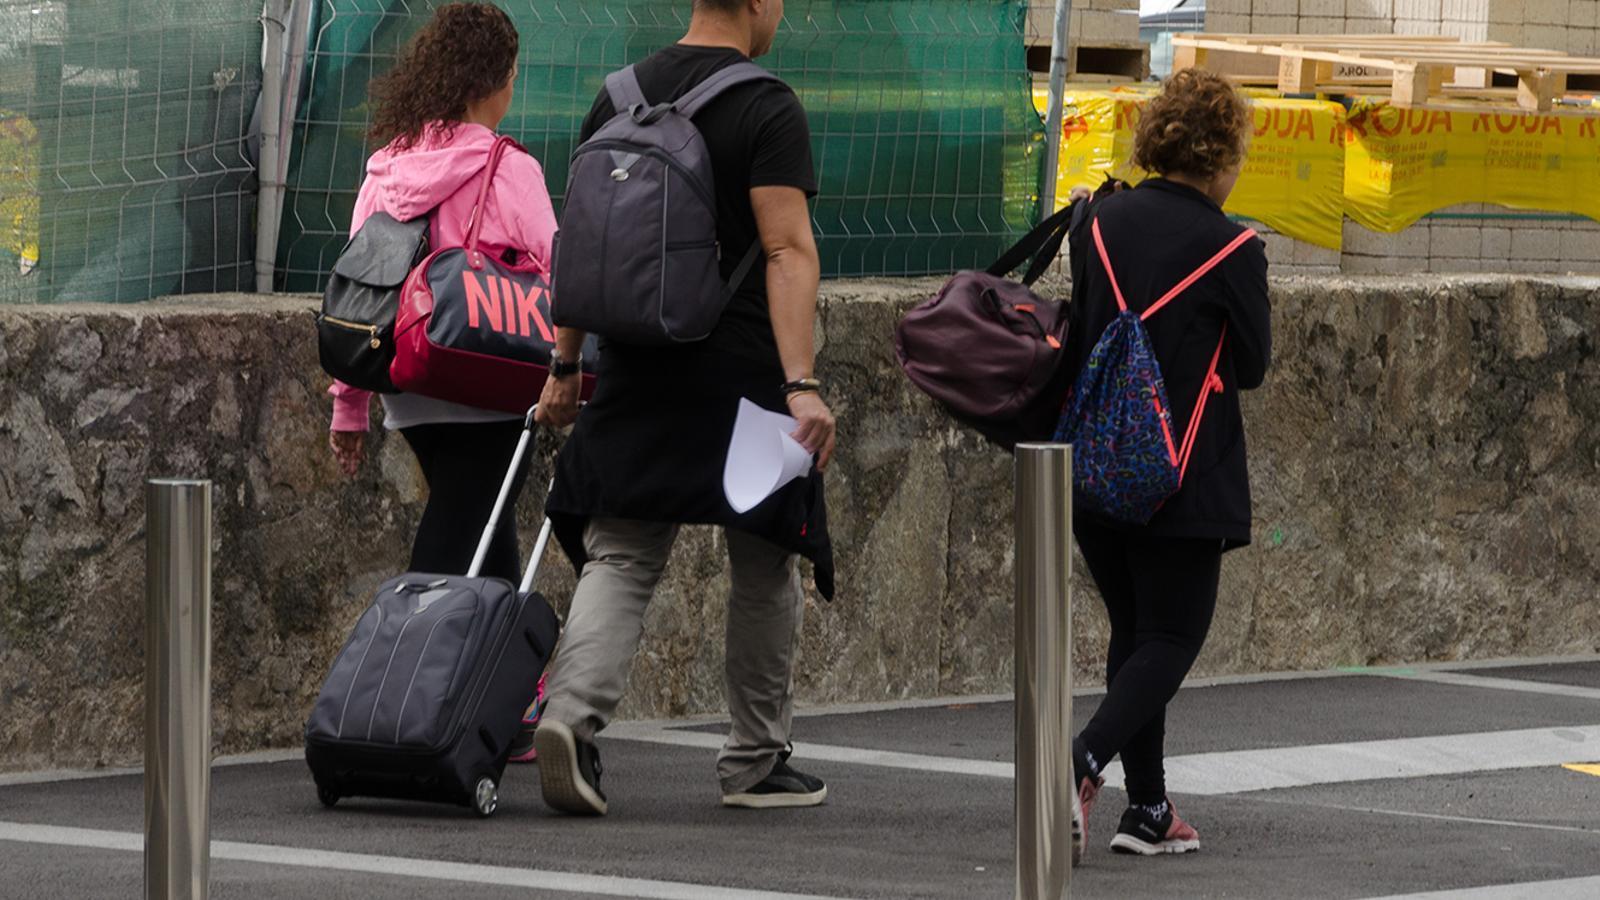 Turistes en un carrer d'Escaldes-Engordany. / ARXIU ANA